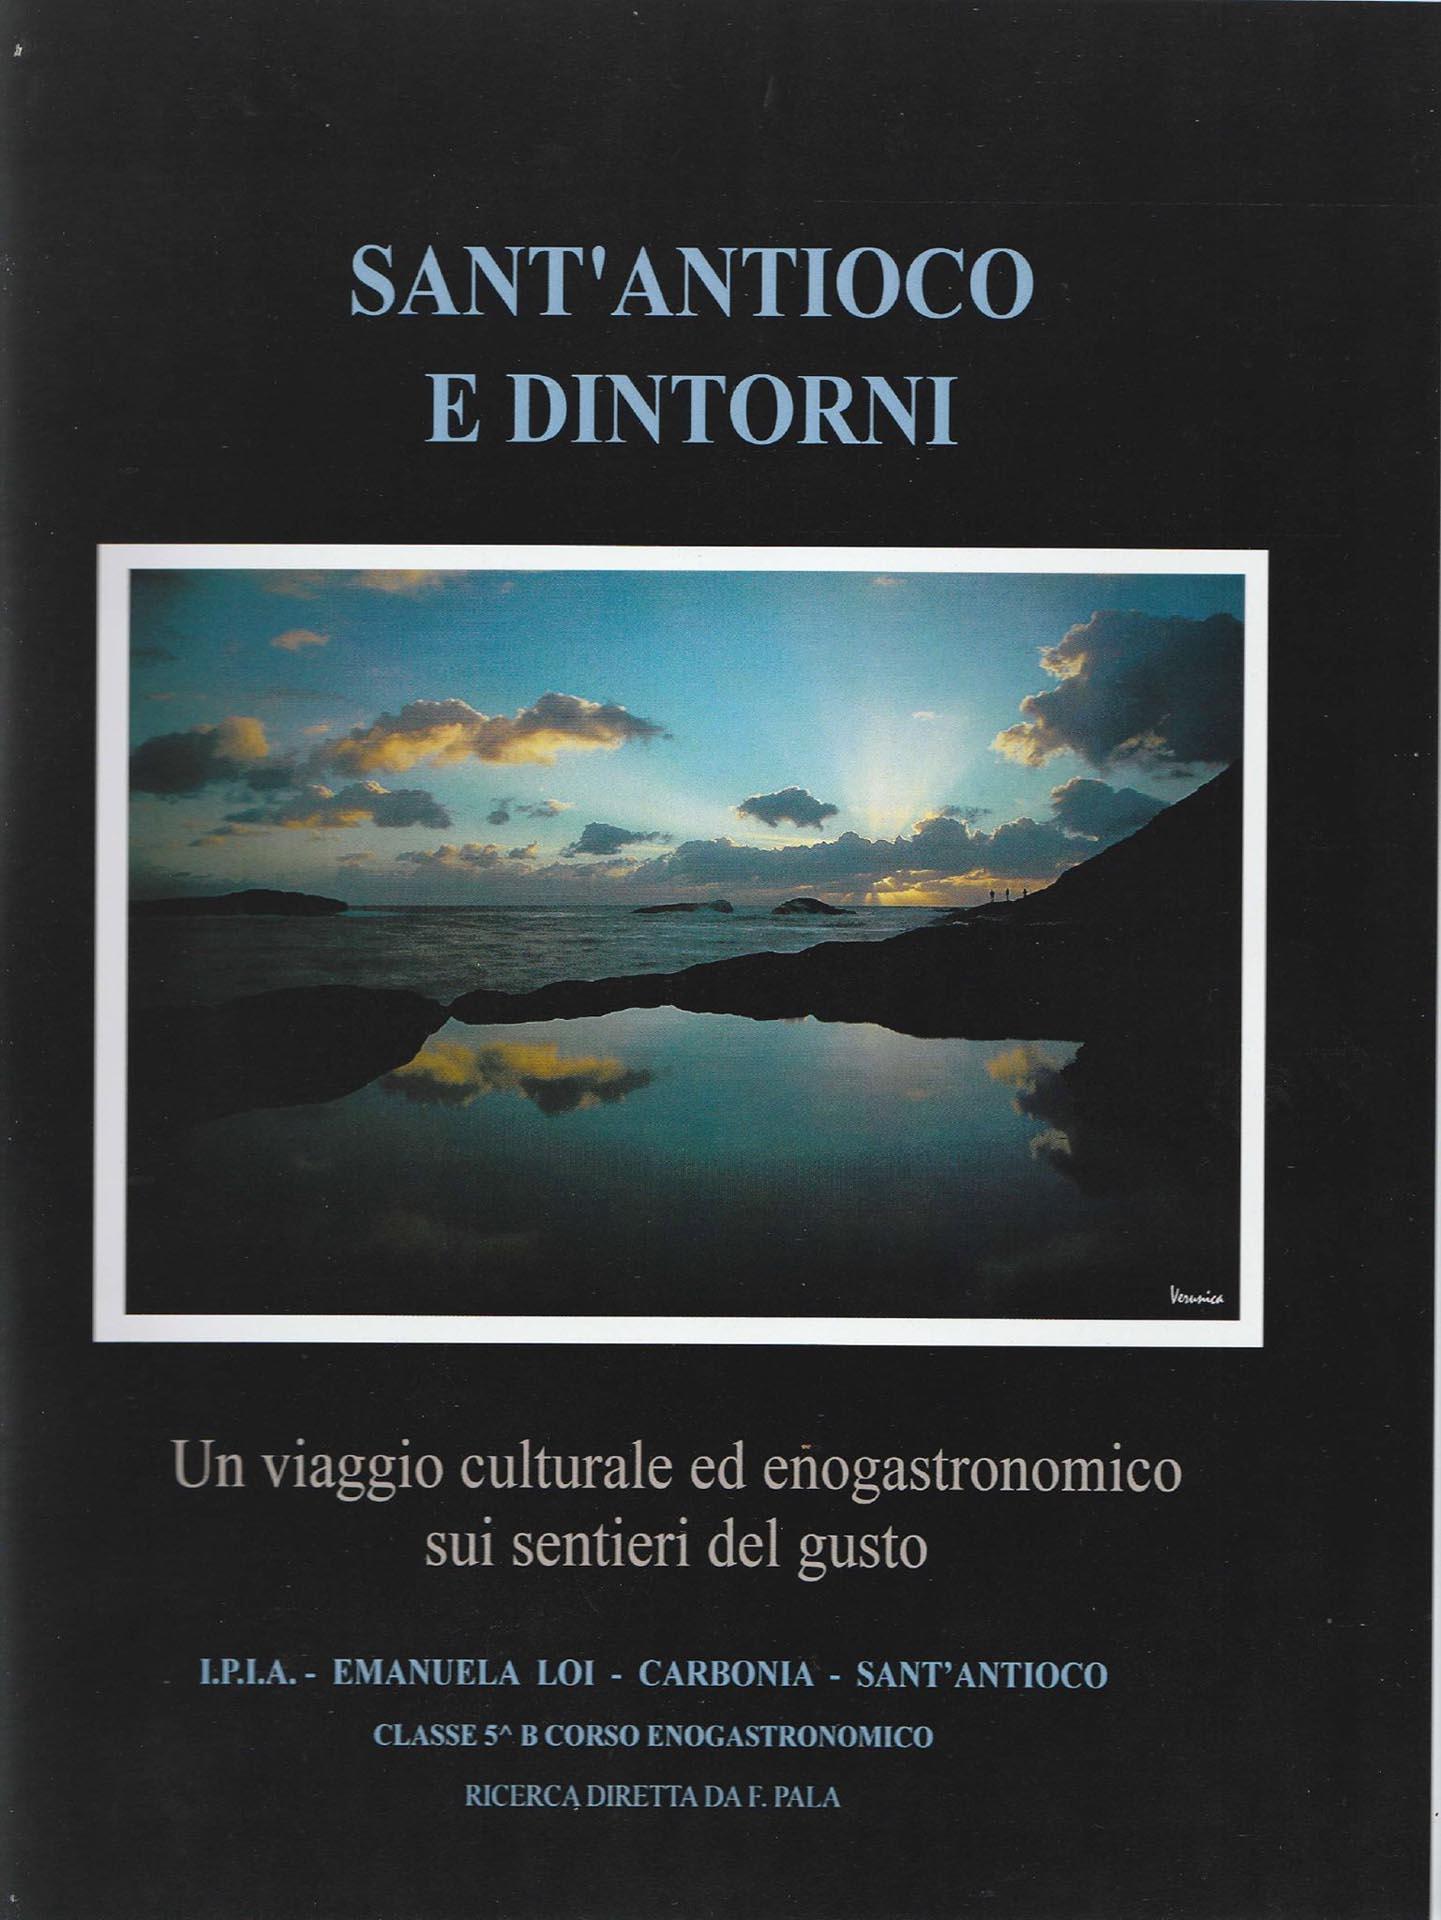 Sant'Antioco e dintorni